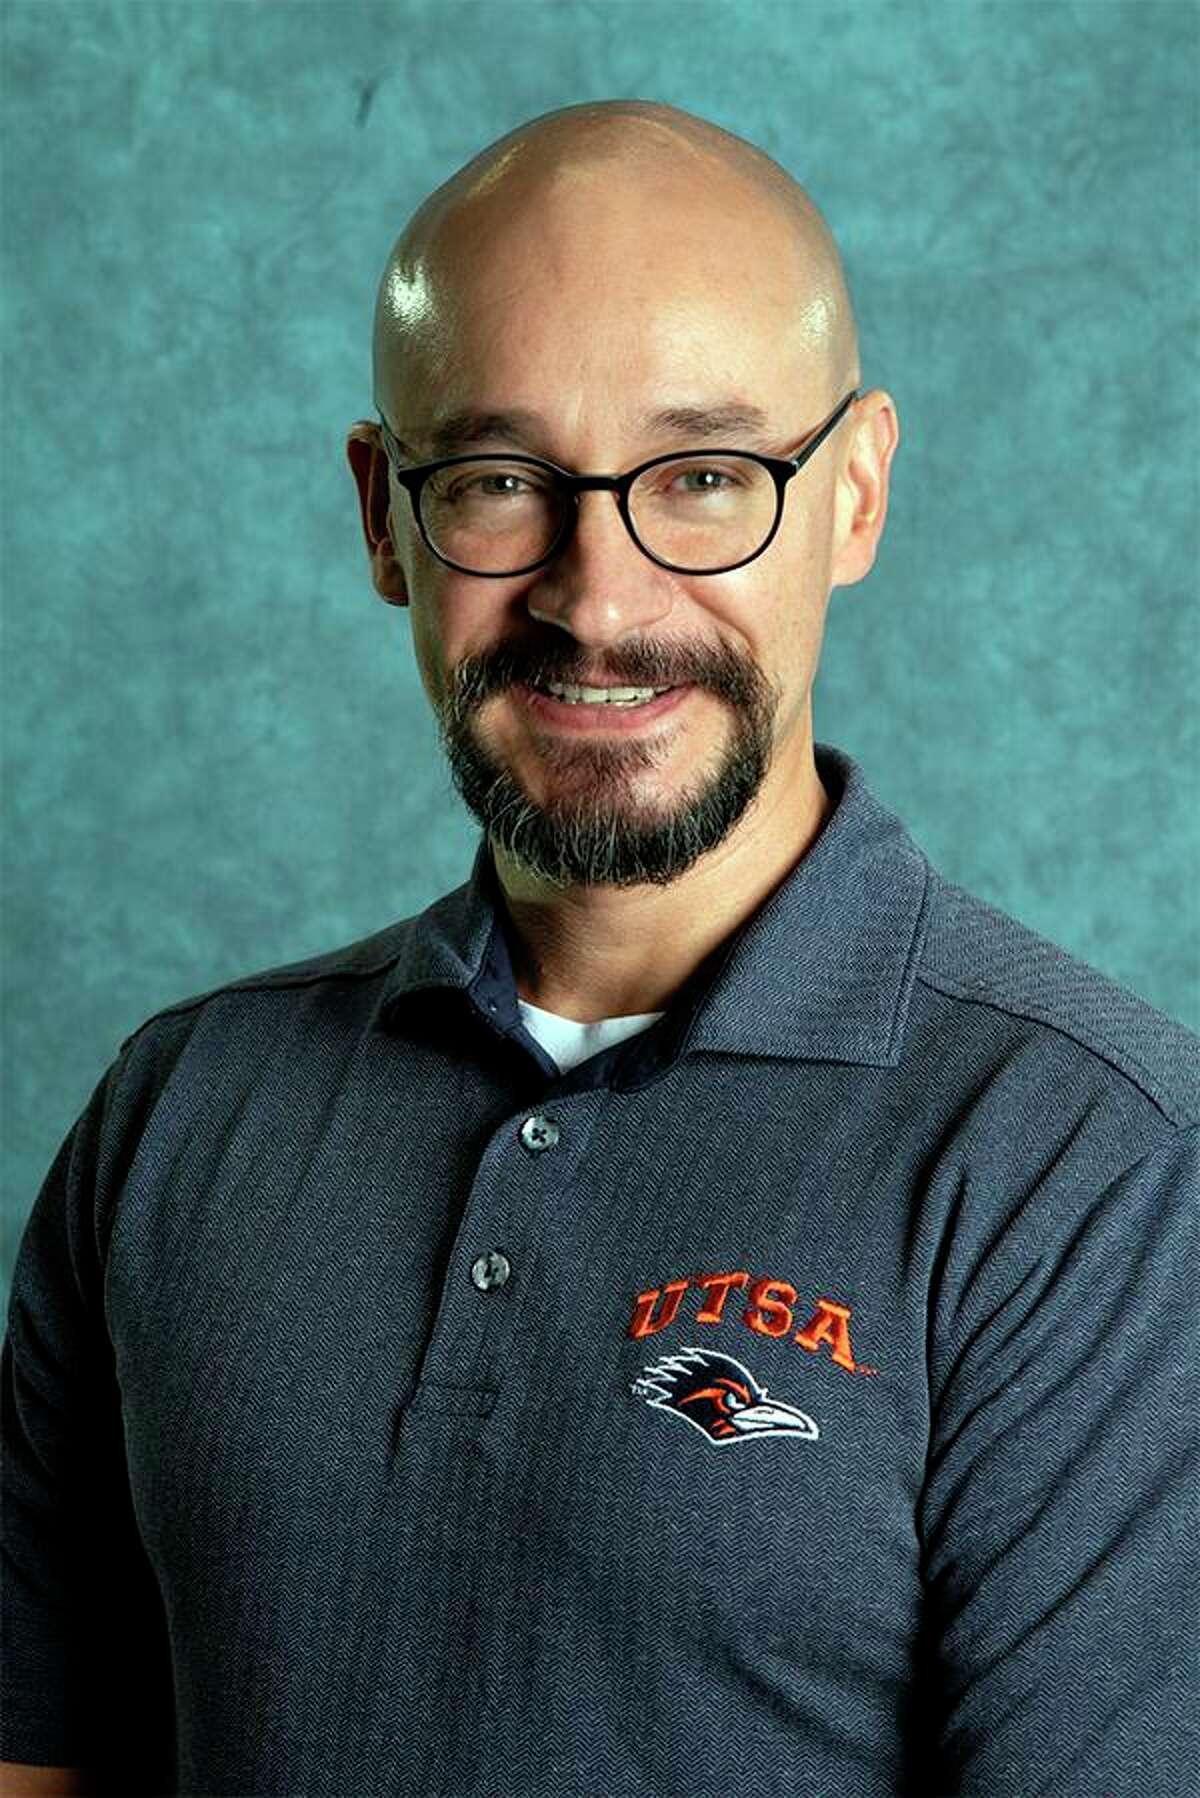 Juan B. Gutiérrez, Ph.D. is Professor and Chair of Mathematics at the University of Texas at San Antonio.